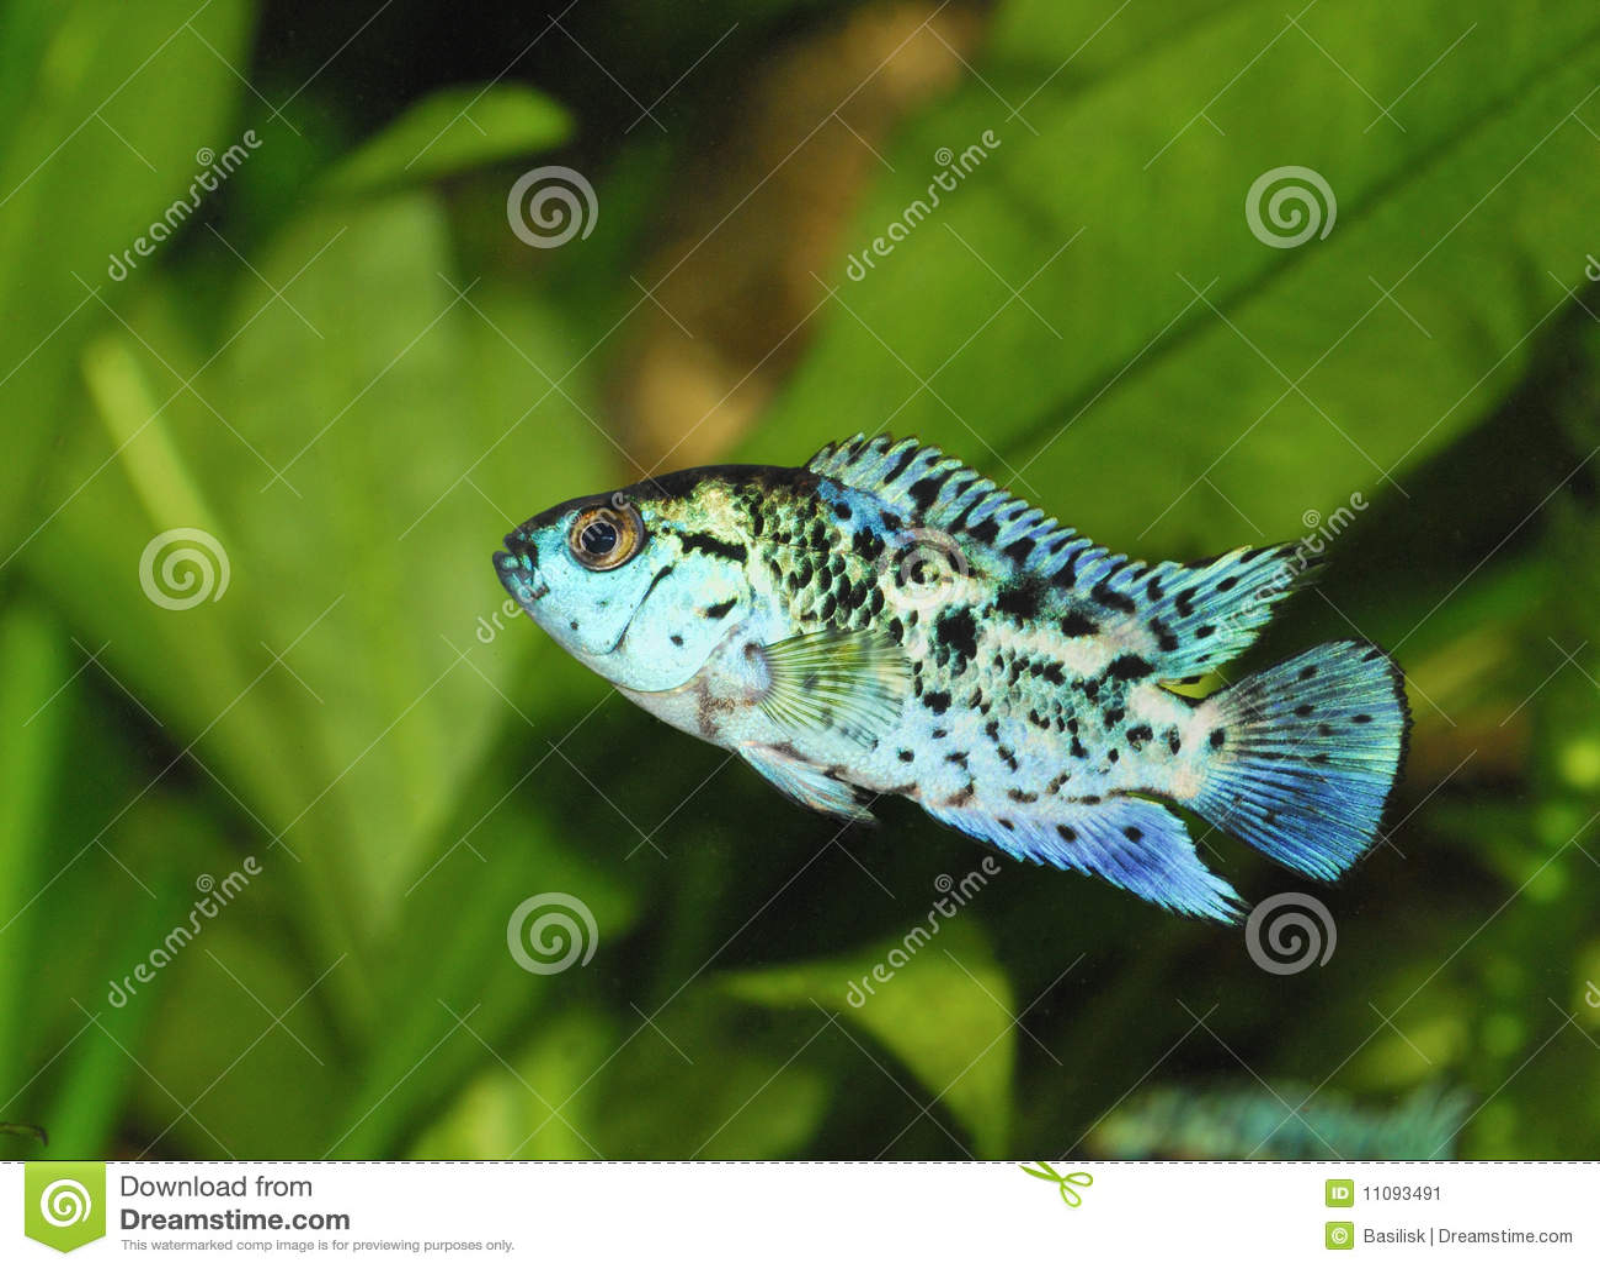 blaue exotische fische im aquarium stockbild bild 11093491. Black Bedroom Furniture Sets. Home Design Ideas